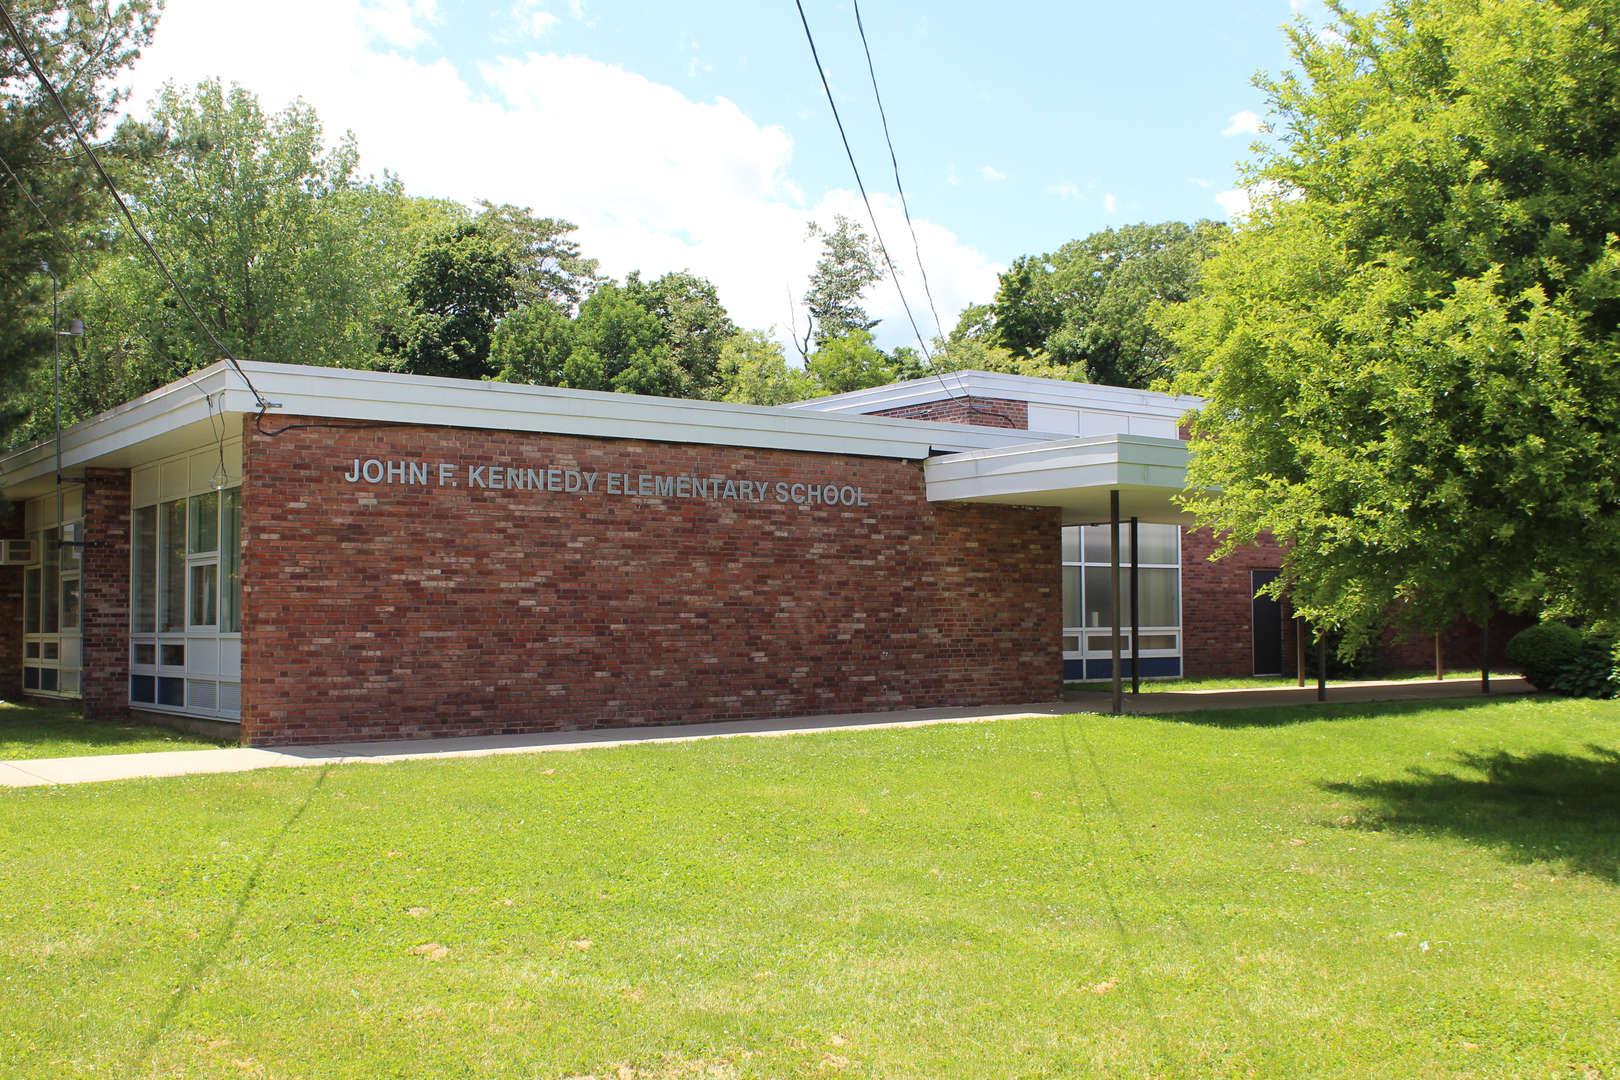 Exterior of John F. Kennedy Elementary School.